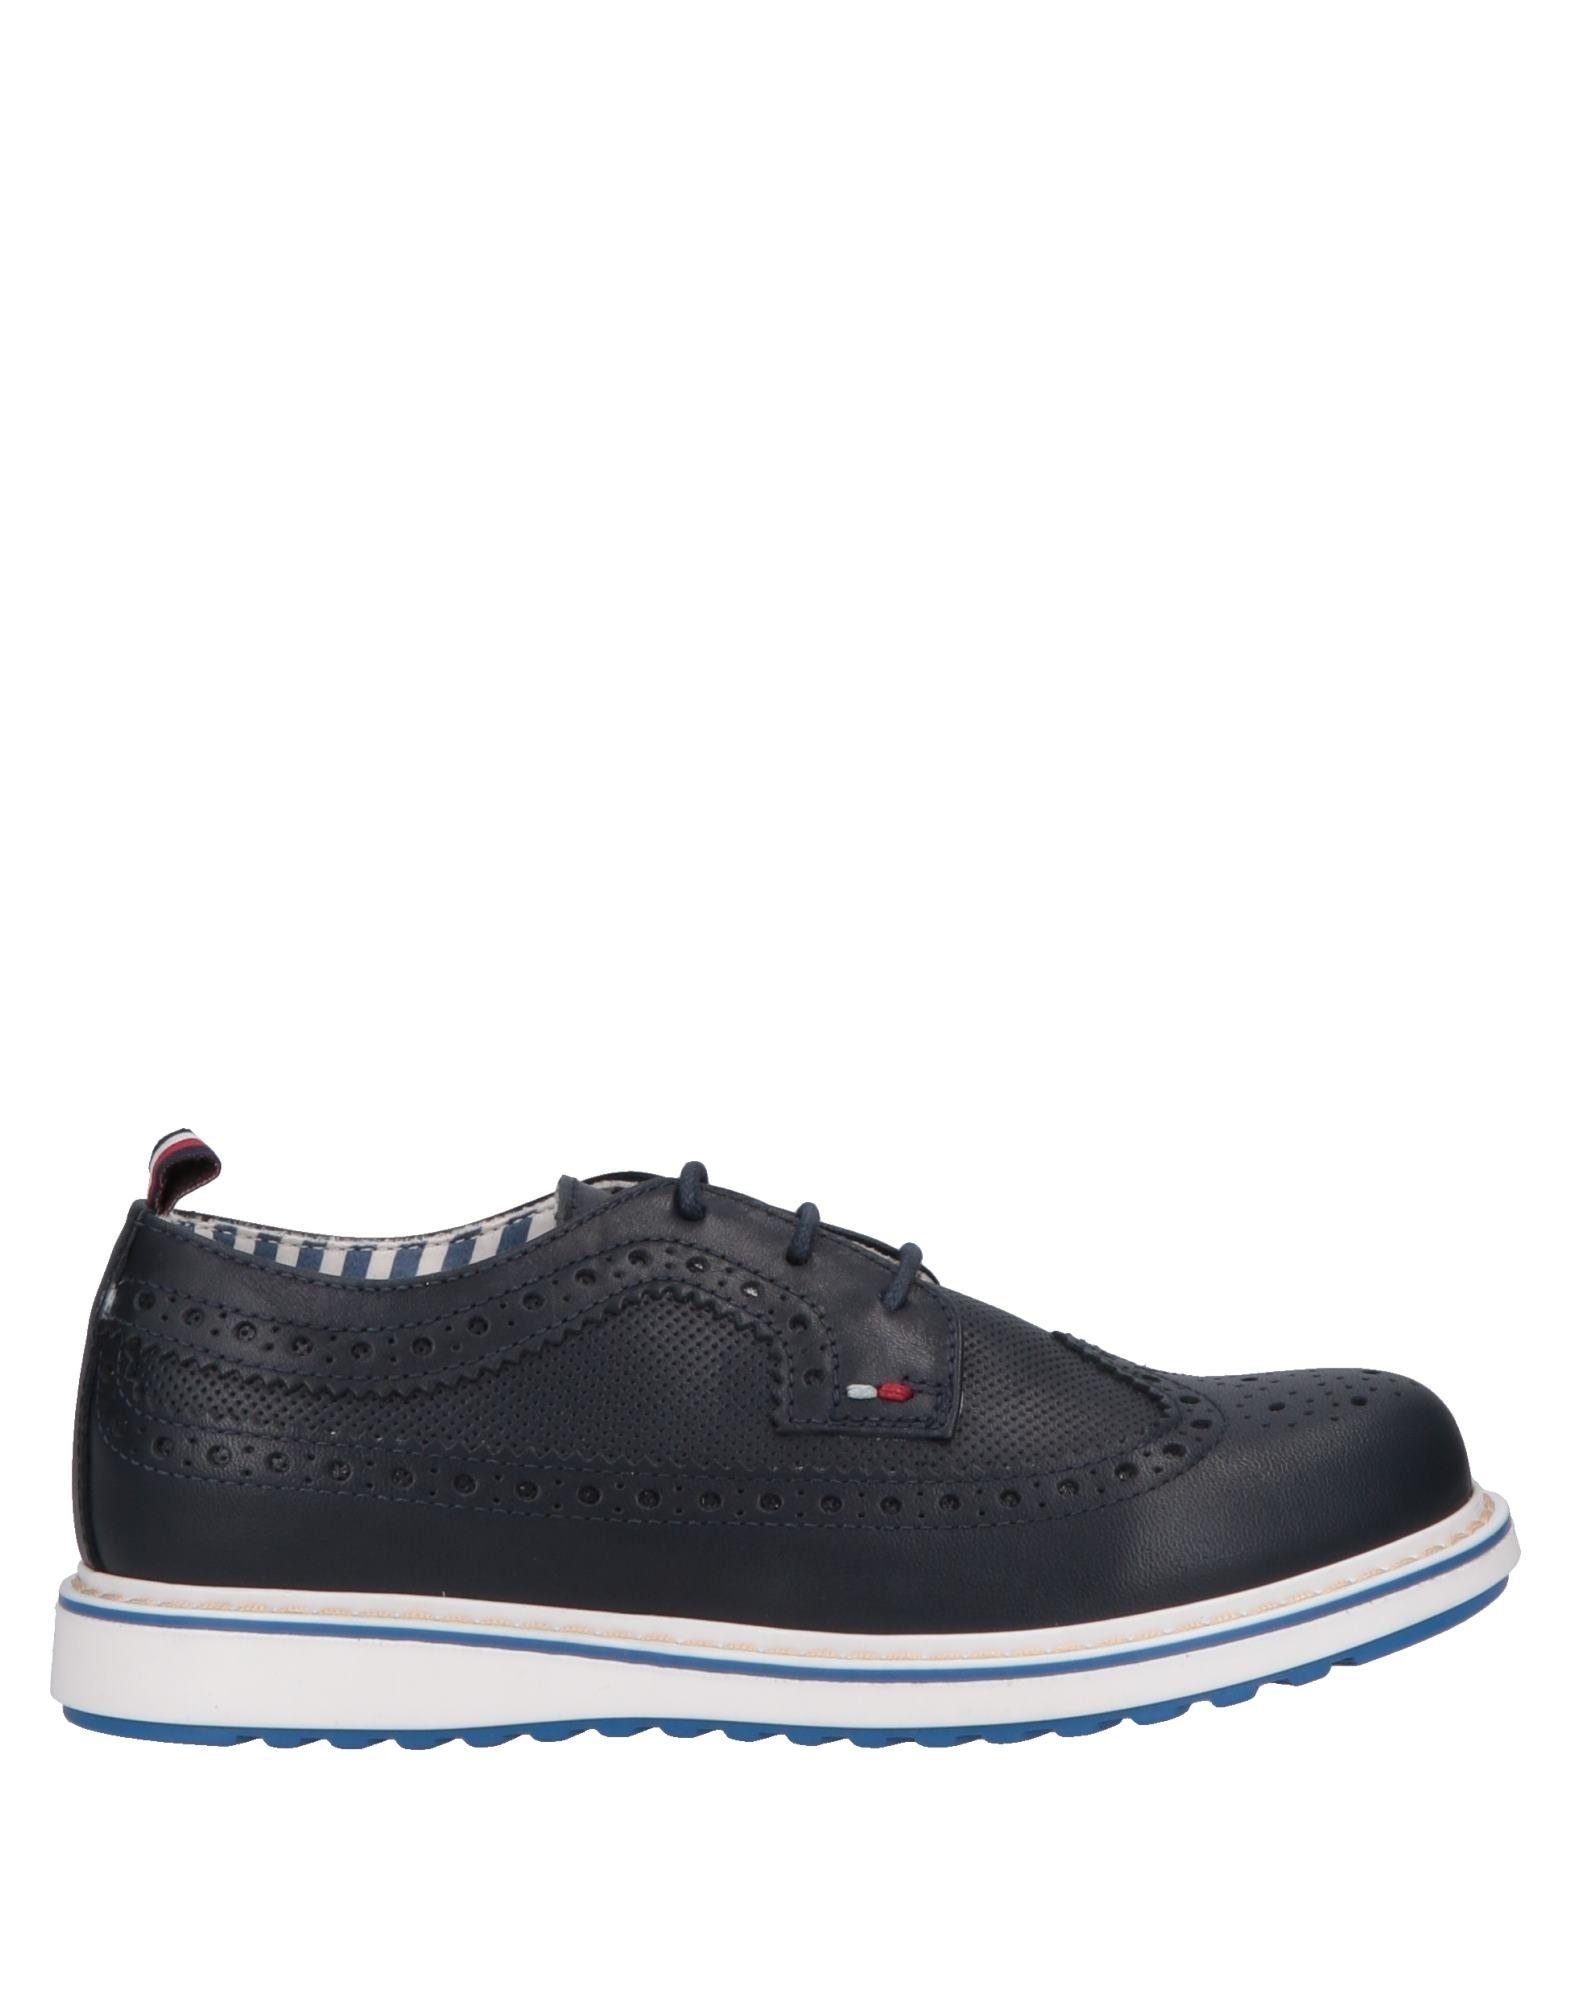 TOMMY HILFIGER Обувь на шнурках pulchrum обувь на шнурках